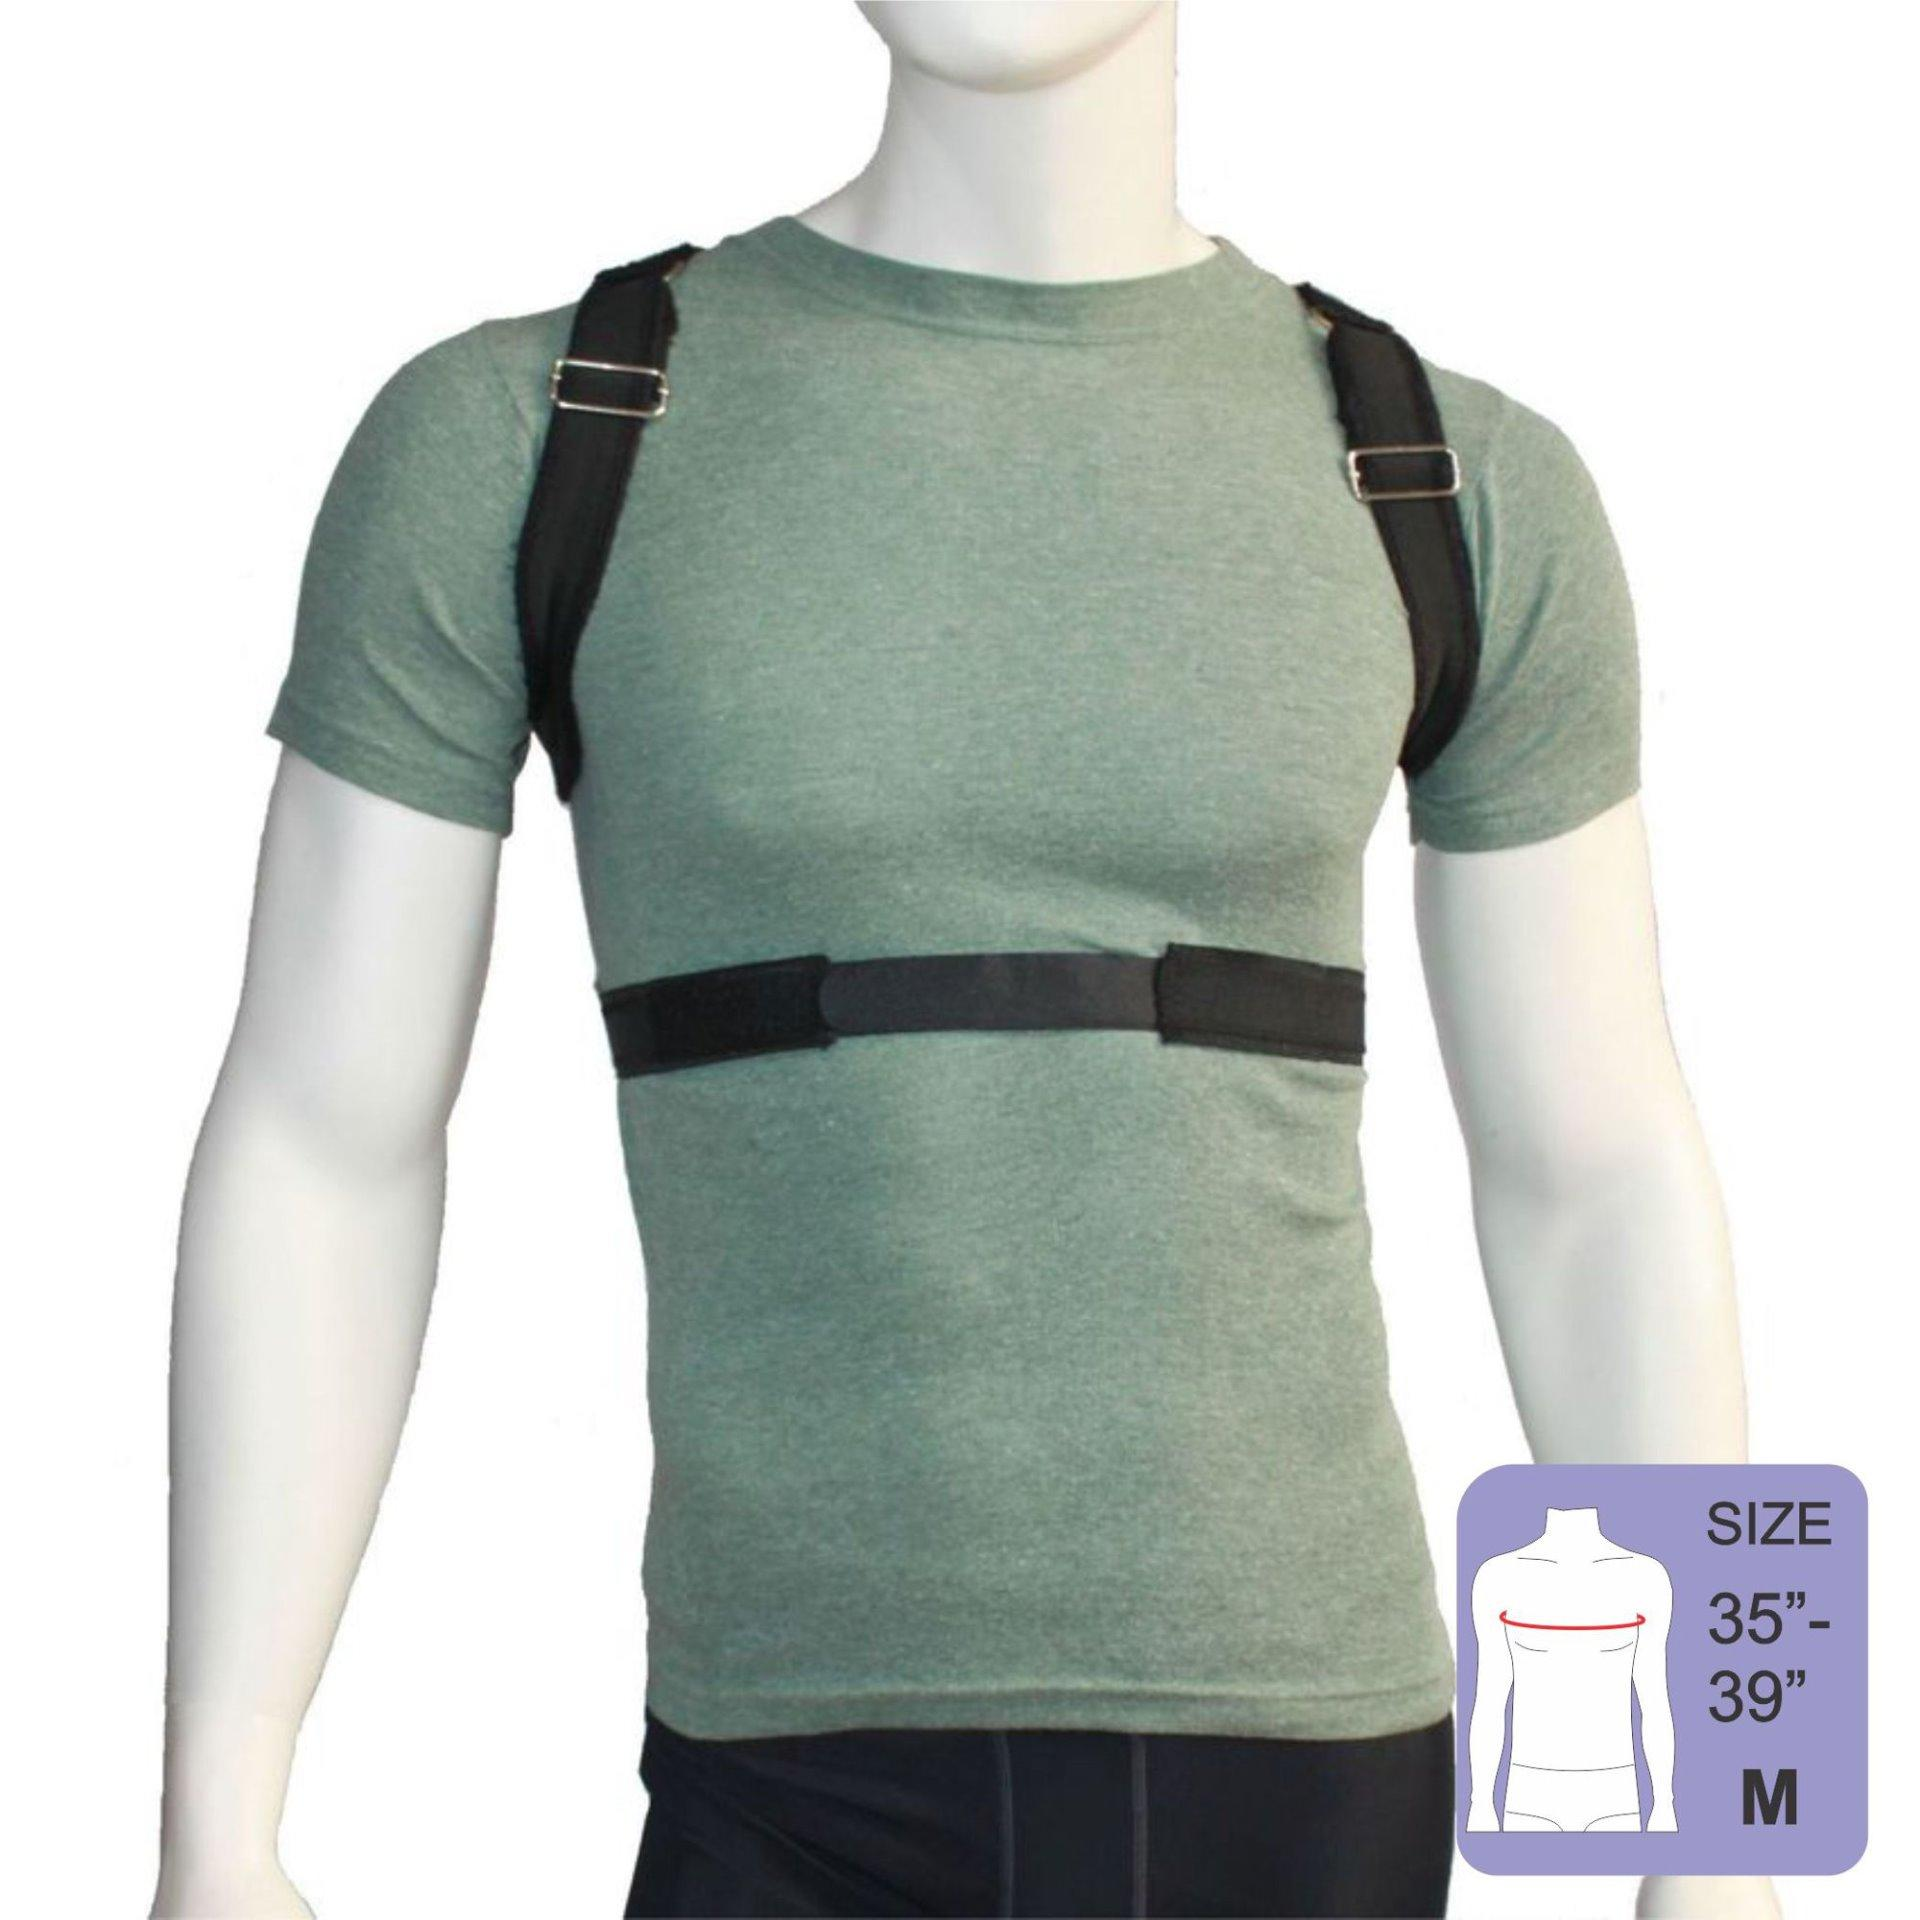 Philippines Procare Protect 4150a Posture Aid Support Adjustable Corrector Shoulder Elastis Strap 2 Way Elastic